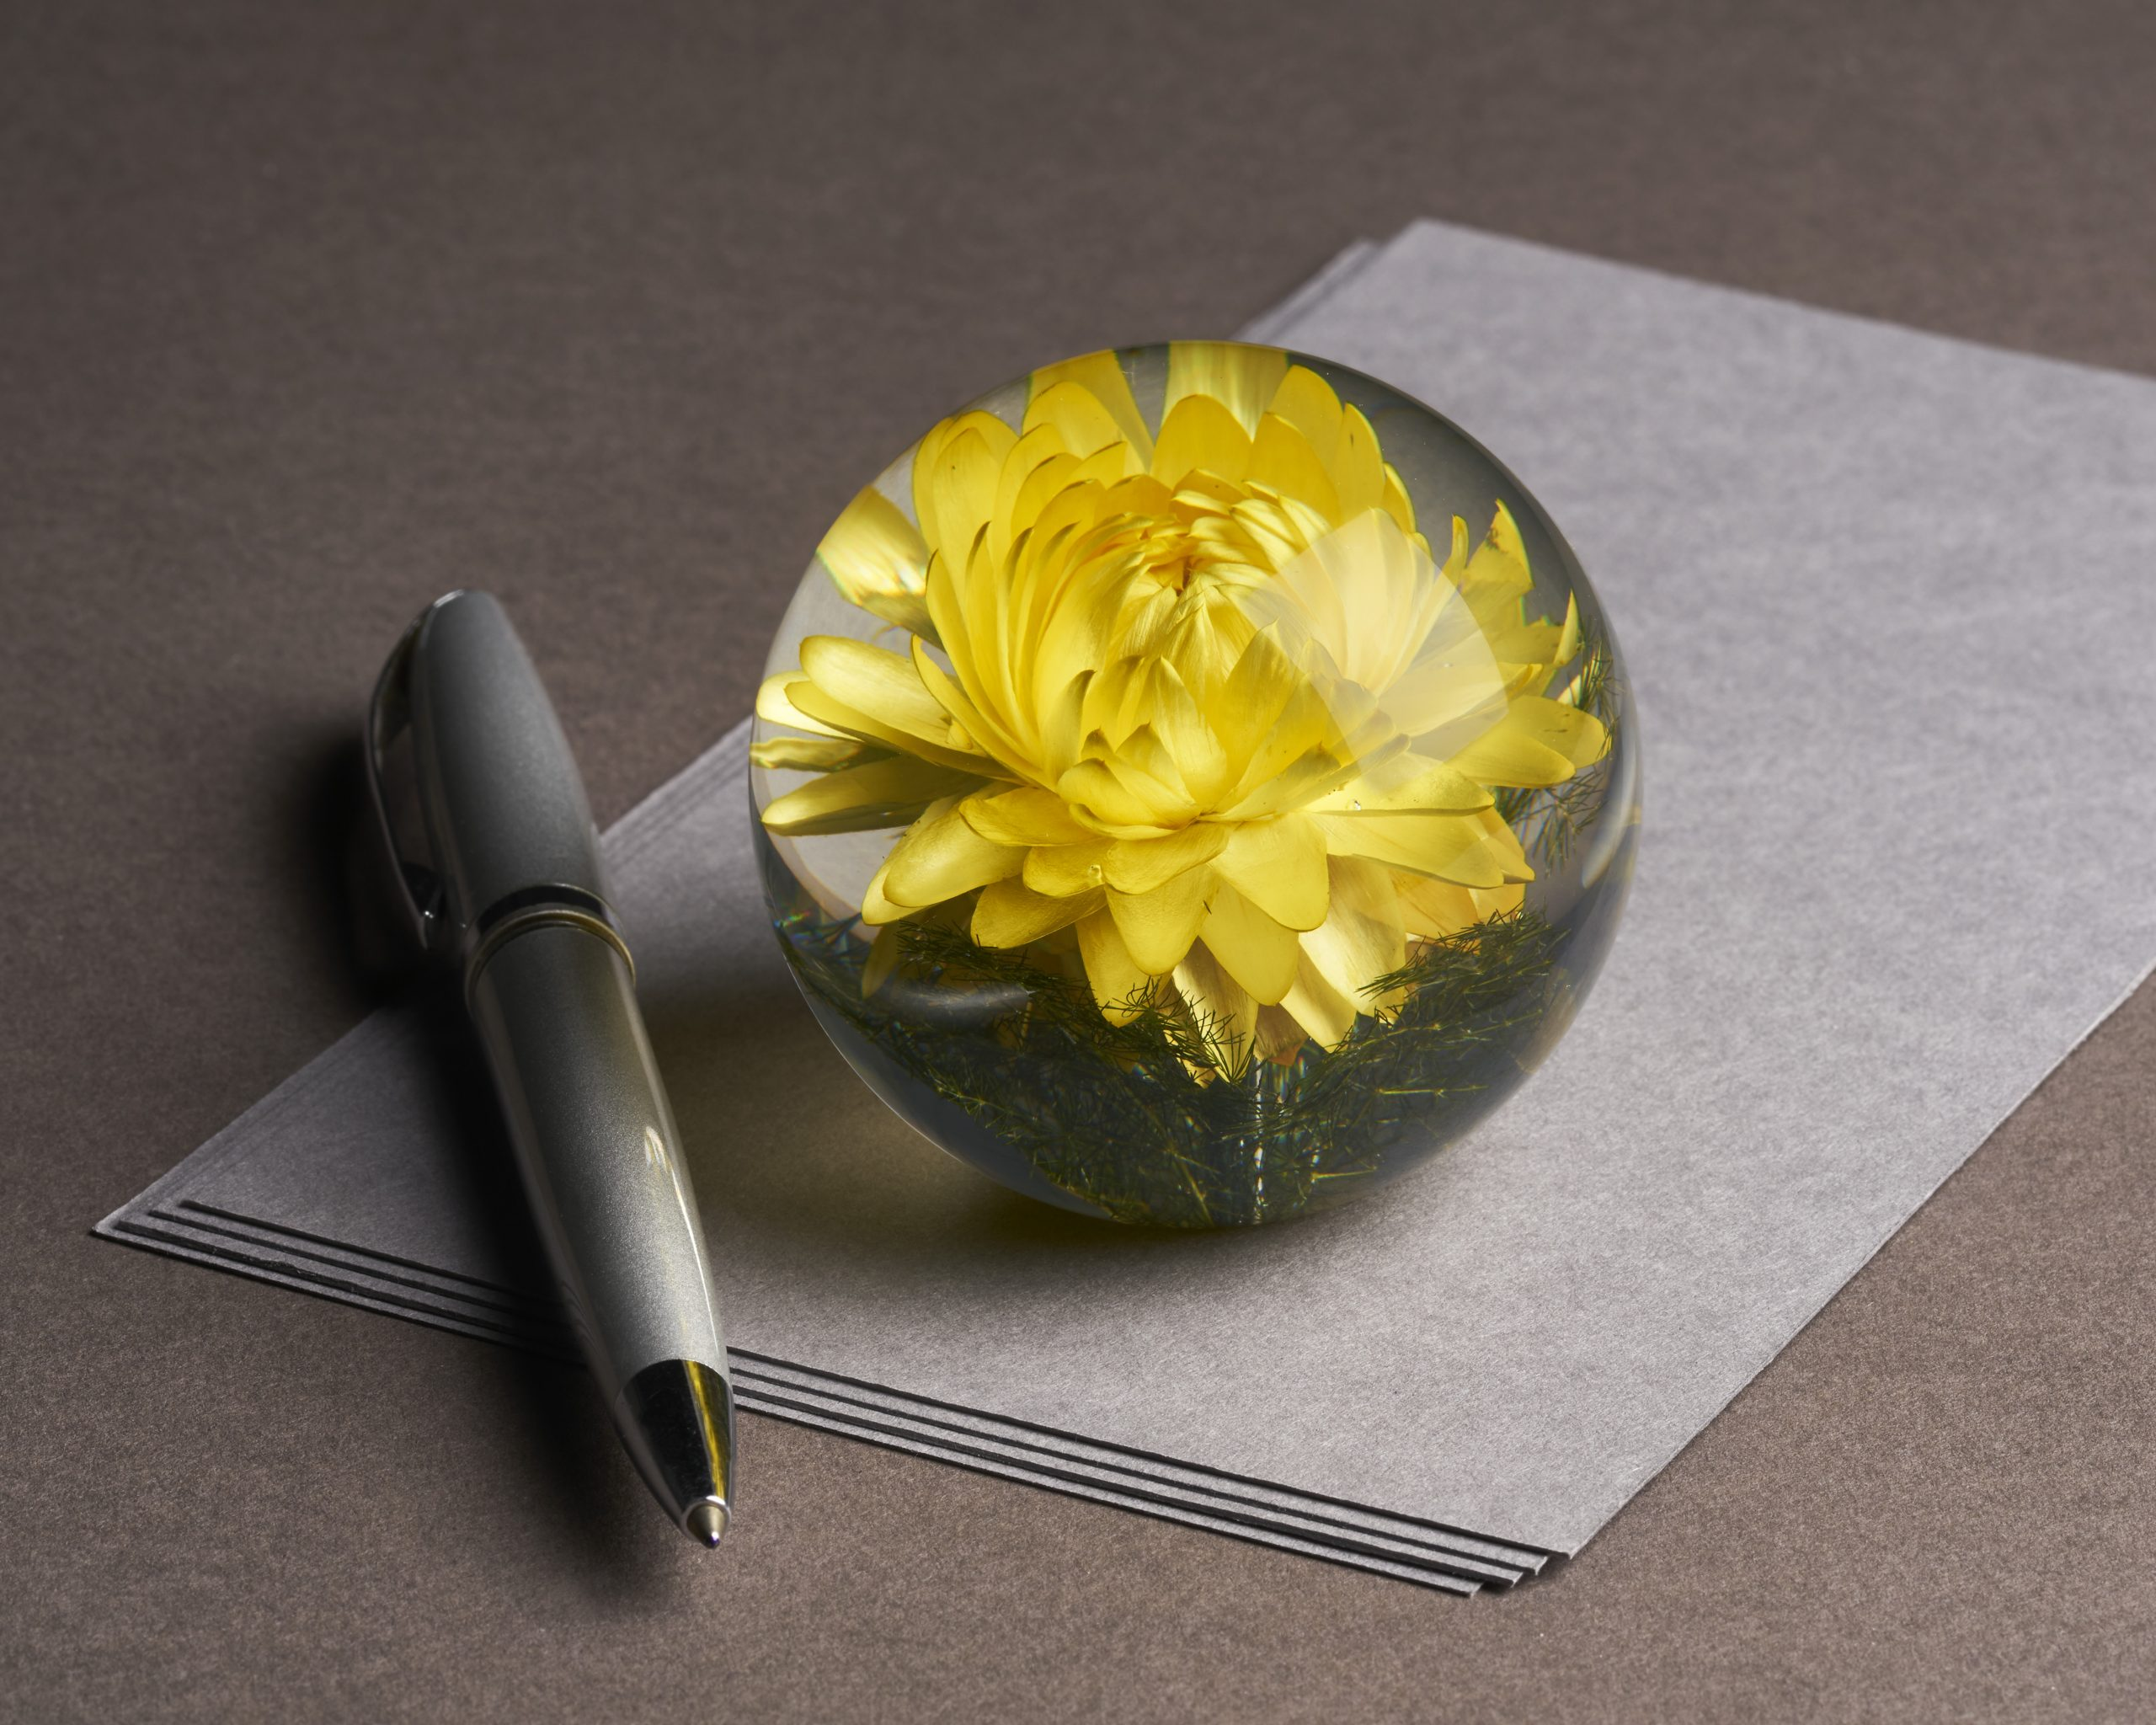 Helichrysum Yellow Gallery Image 1